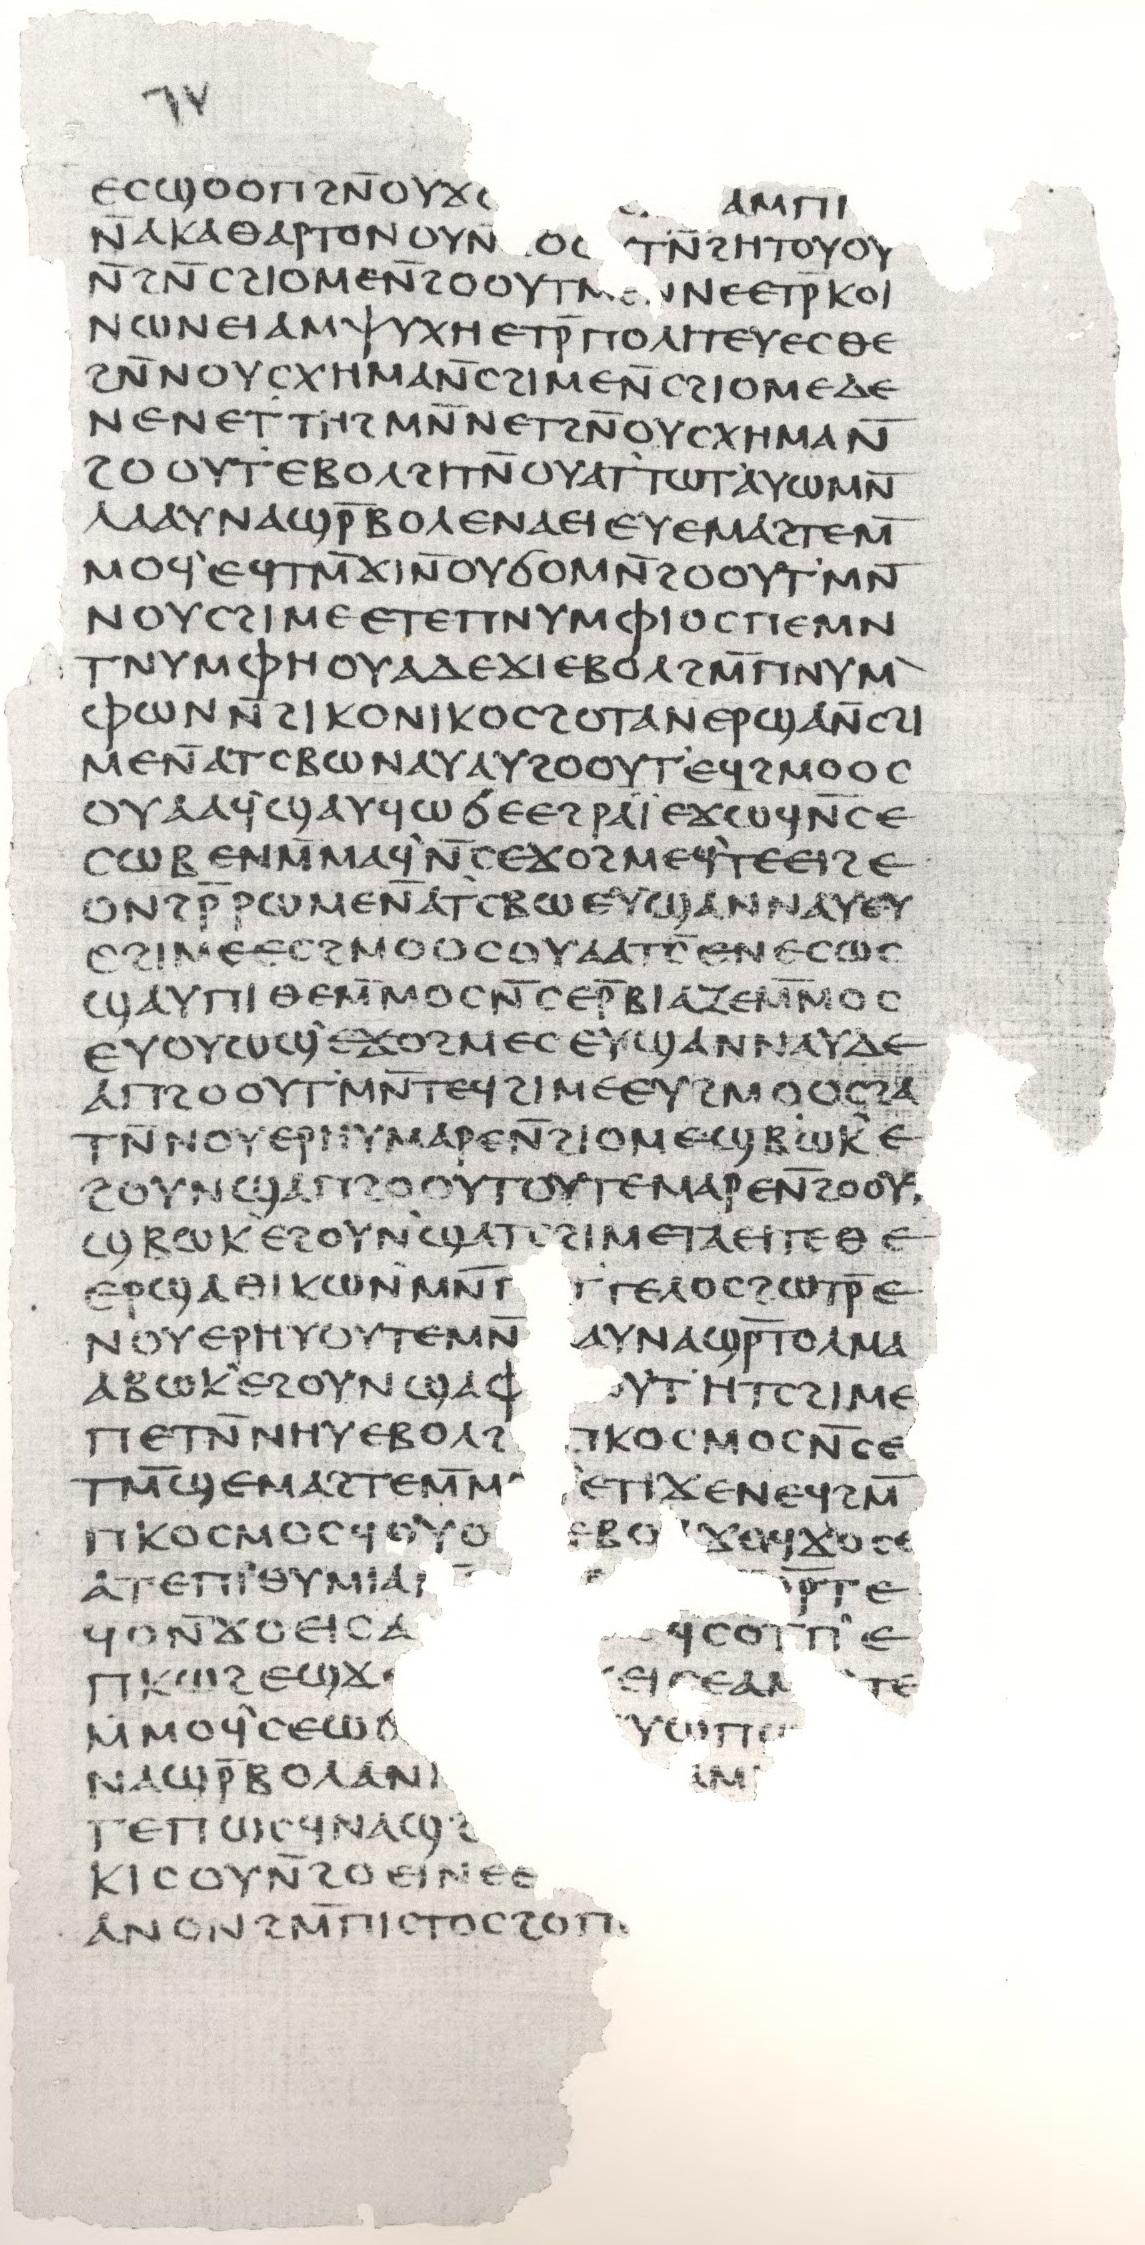 Gospel_of_Philip_facsimile_Page_65.jpg